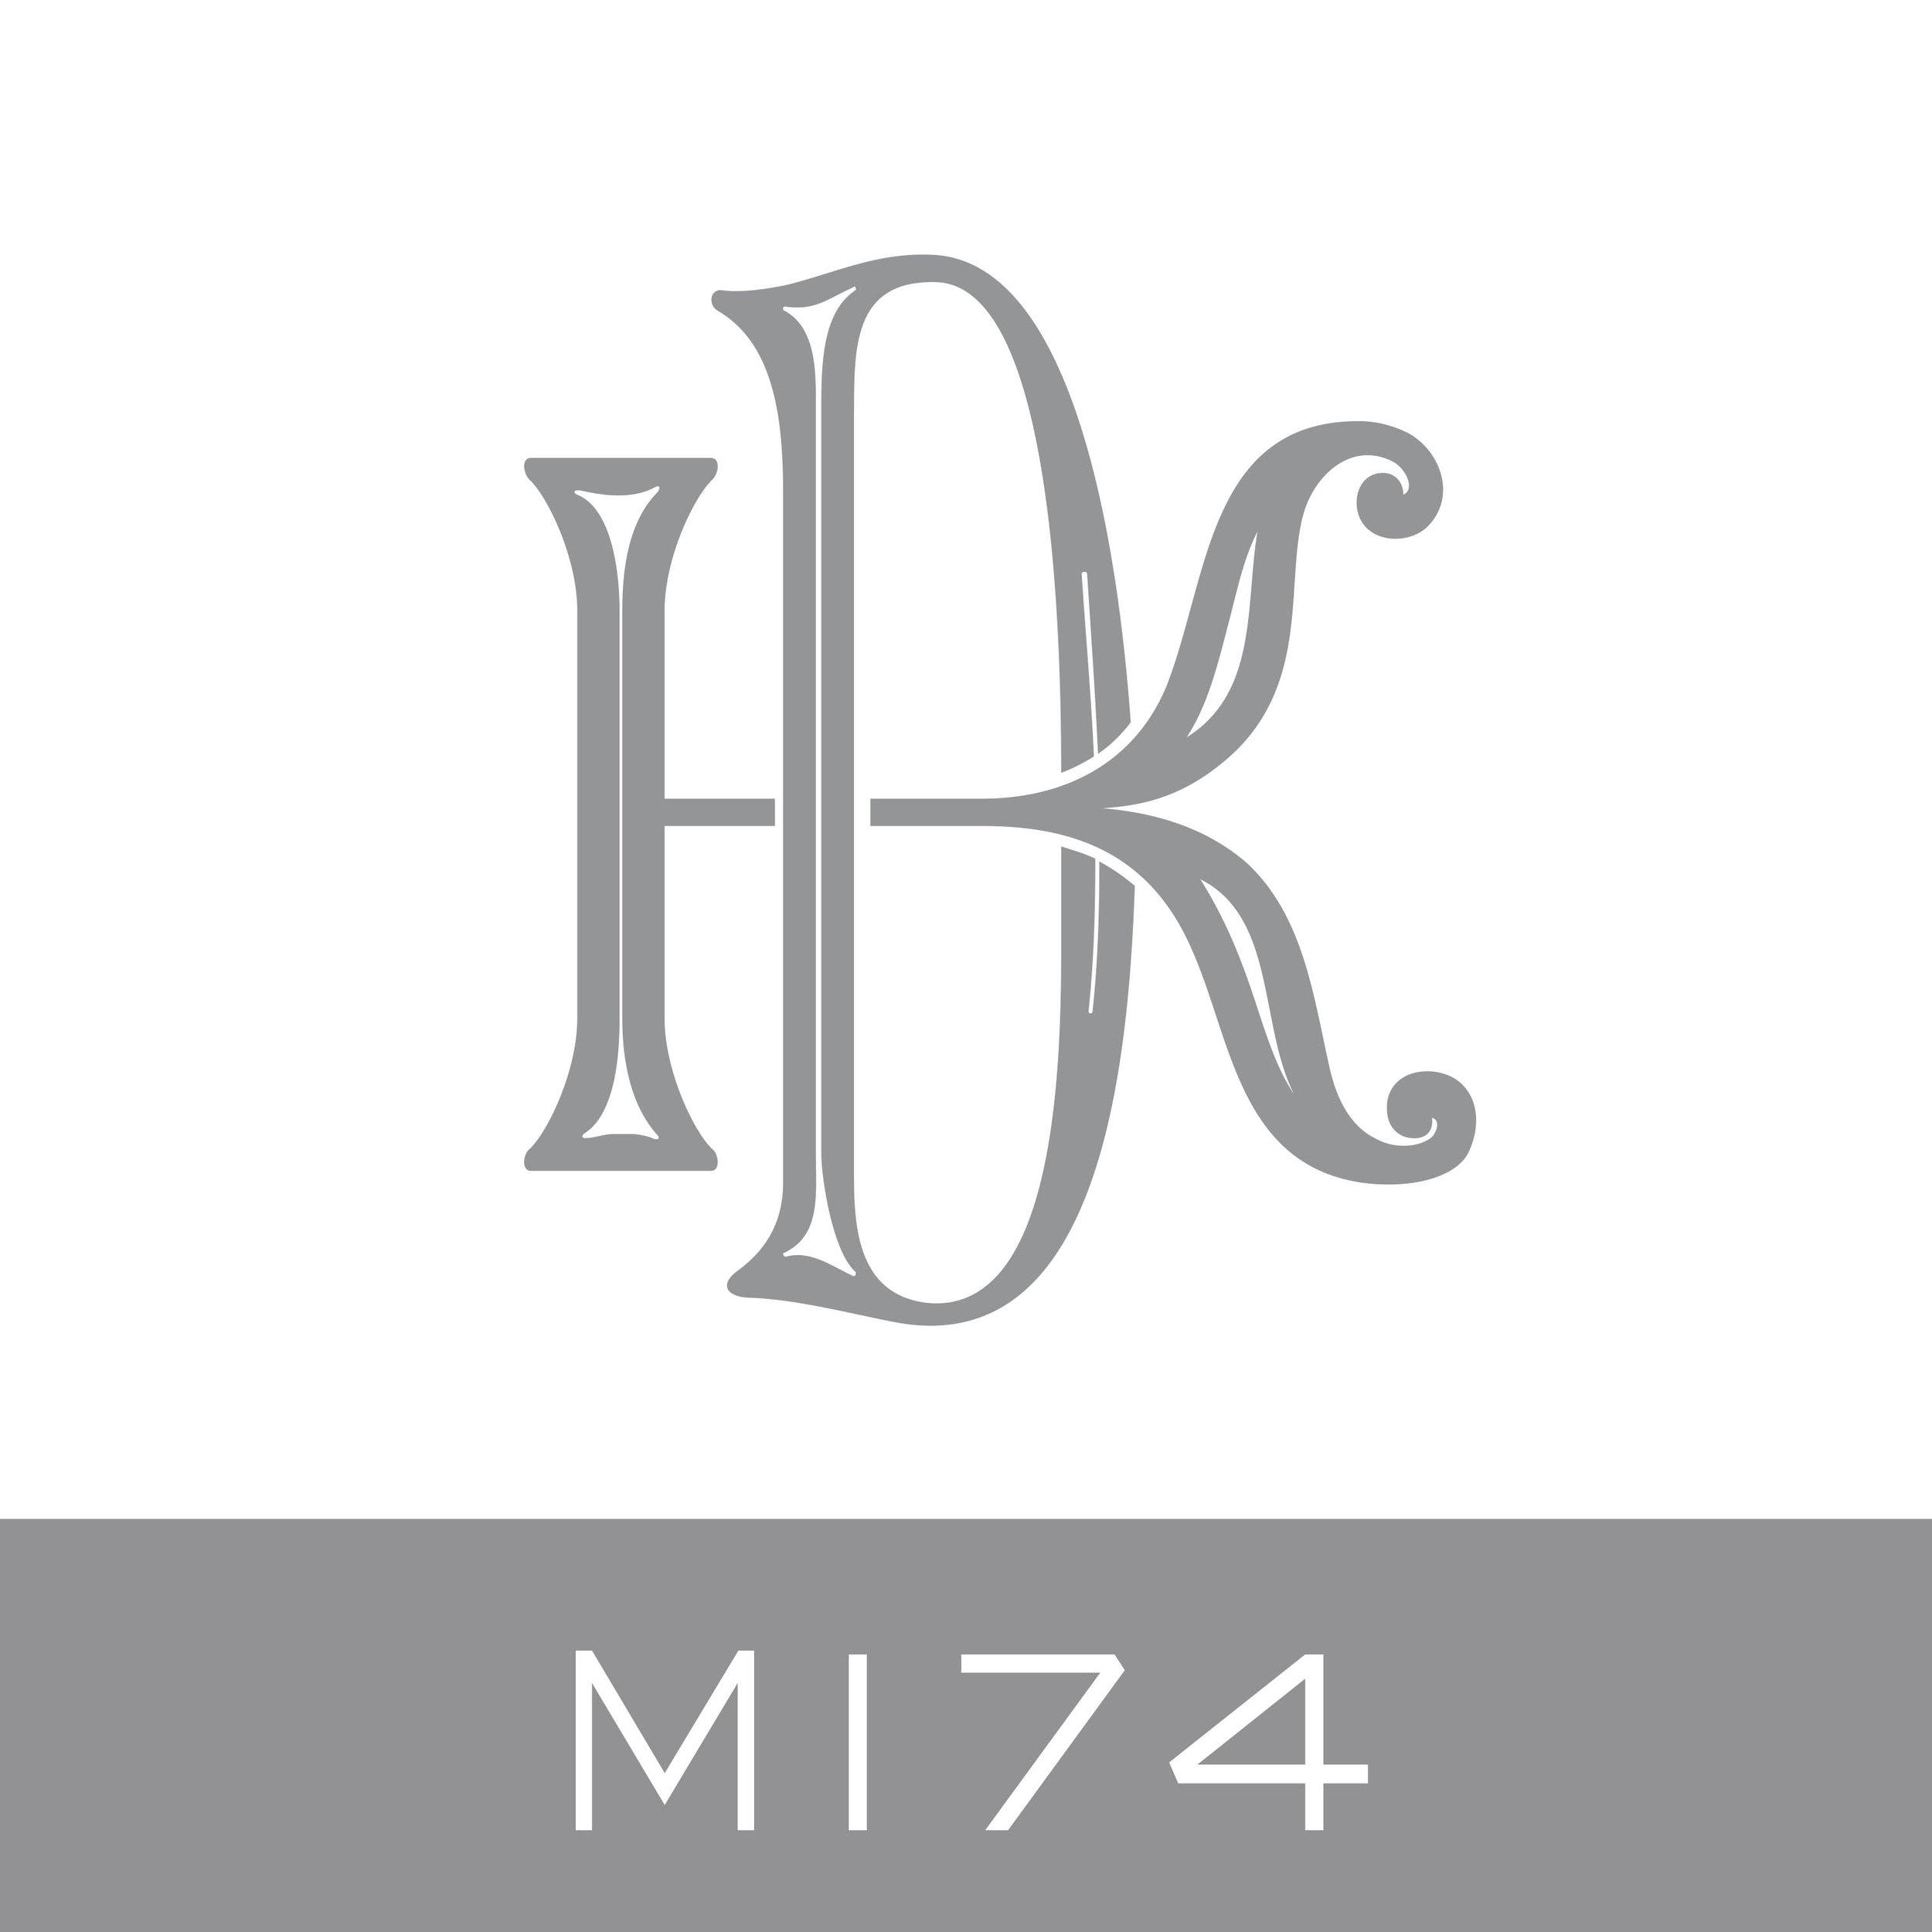 M174.jpg